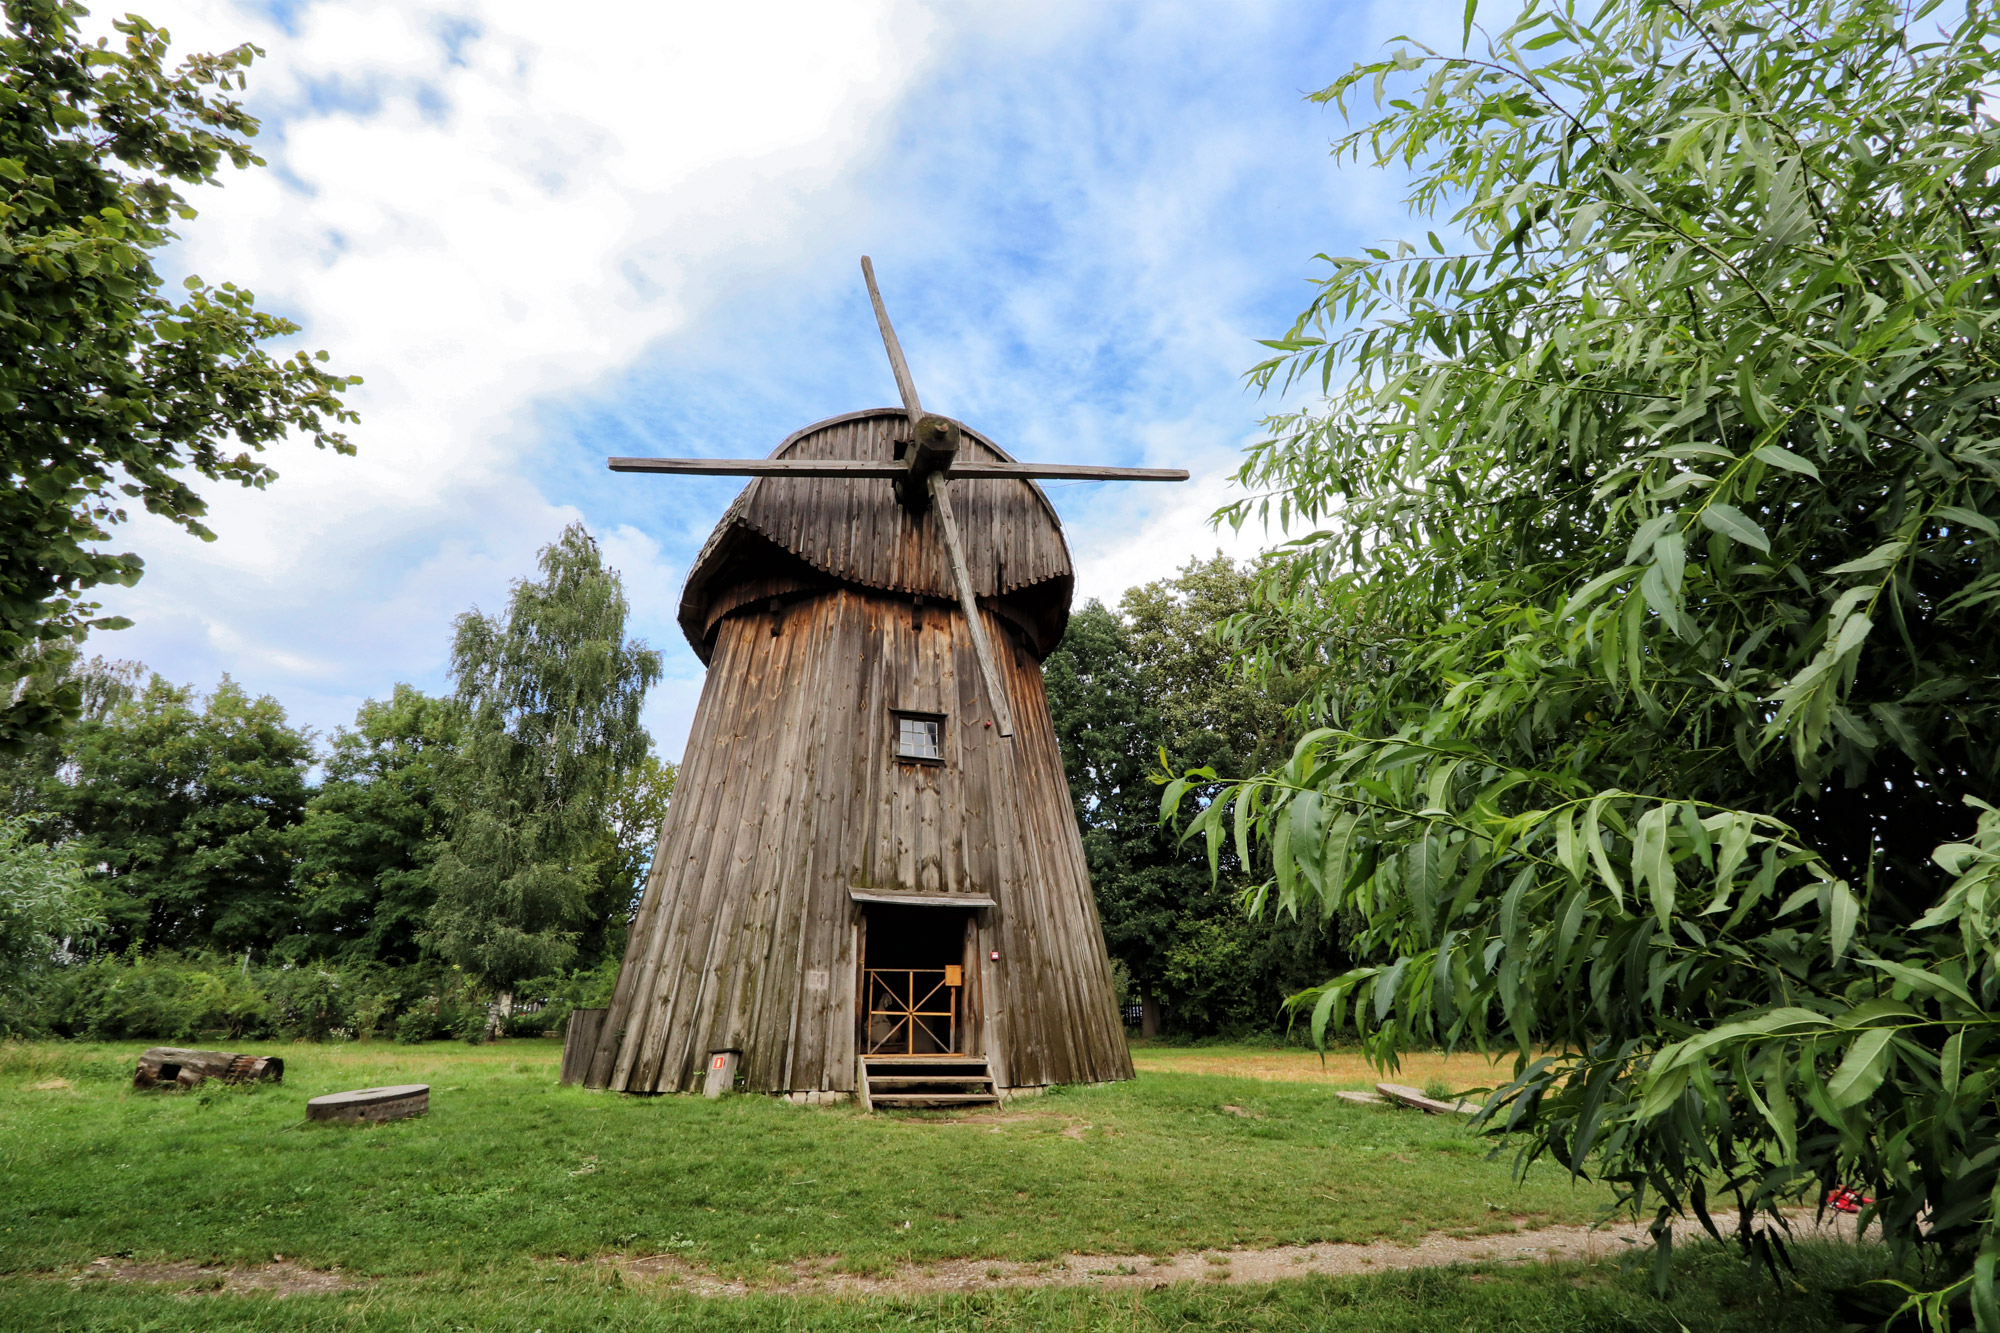 Lubelskie regio - Lublin Open Air Museum